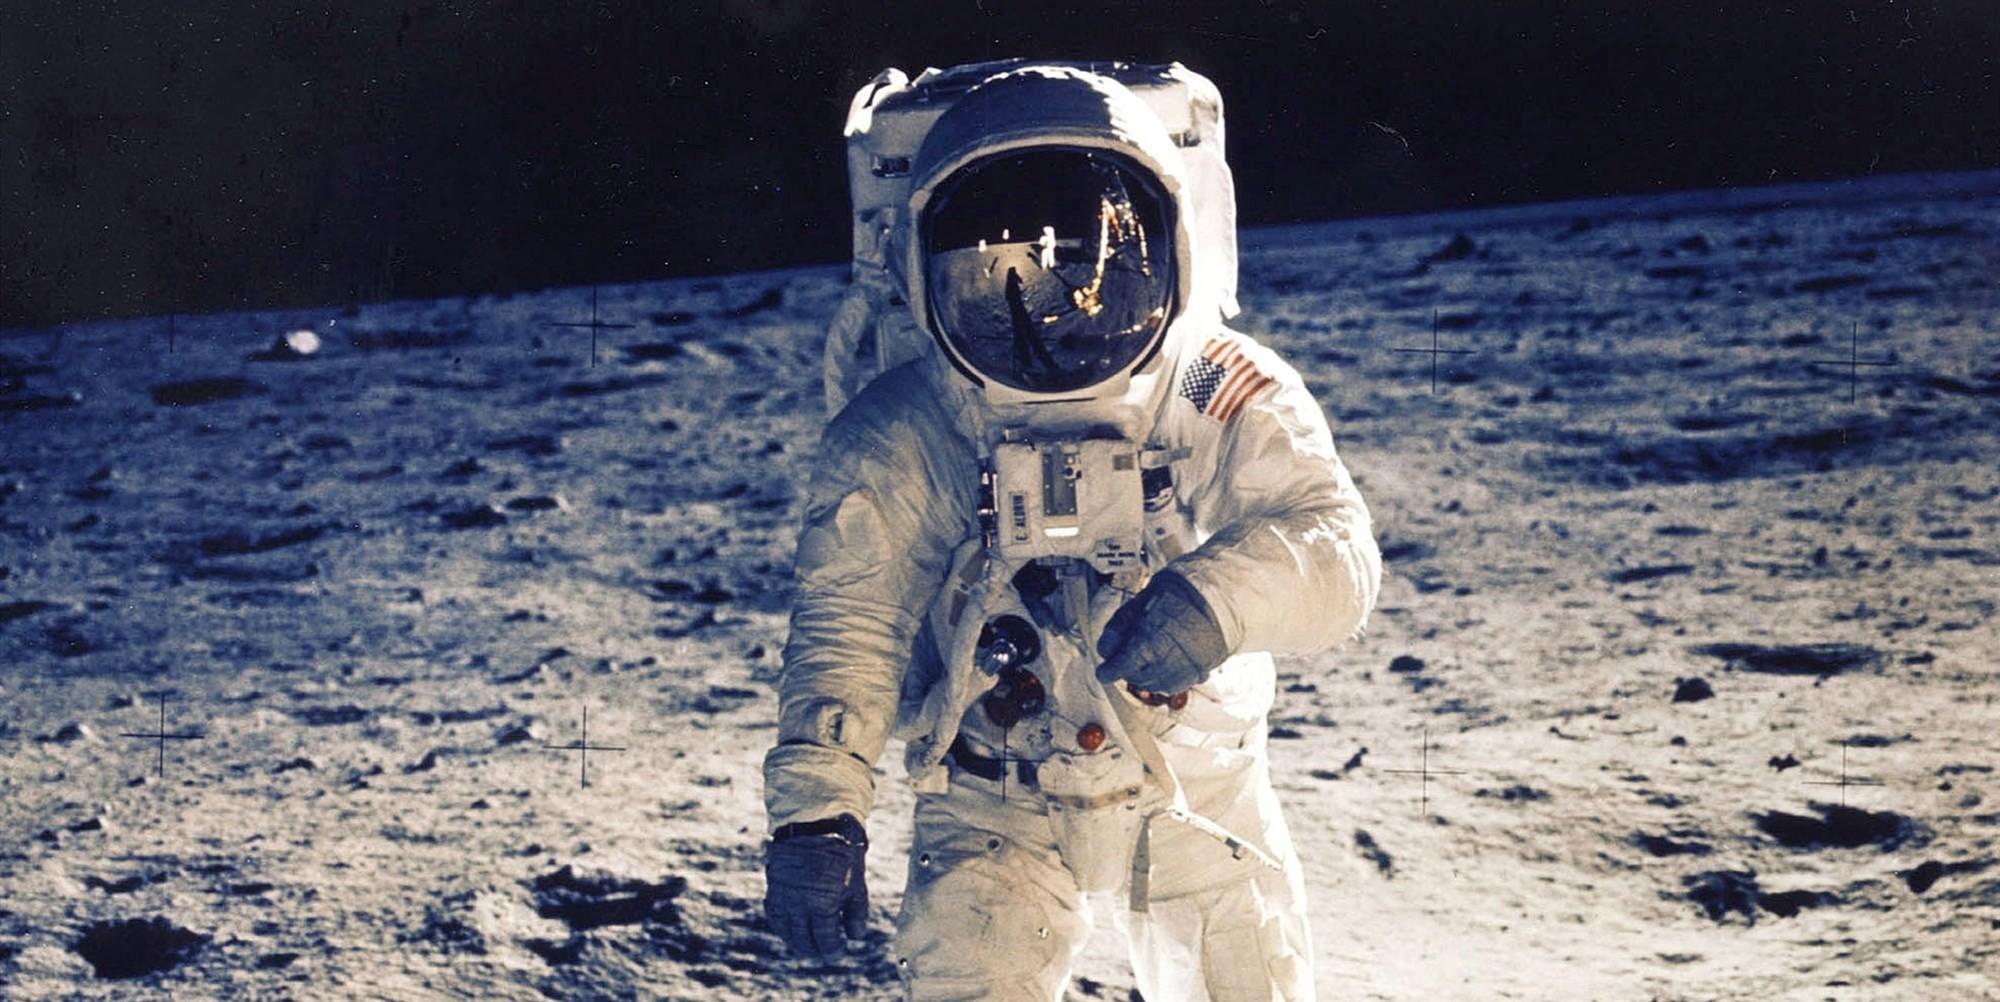 mesacny prach lunarna rakovina astronauti misia vyskum